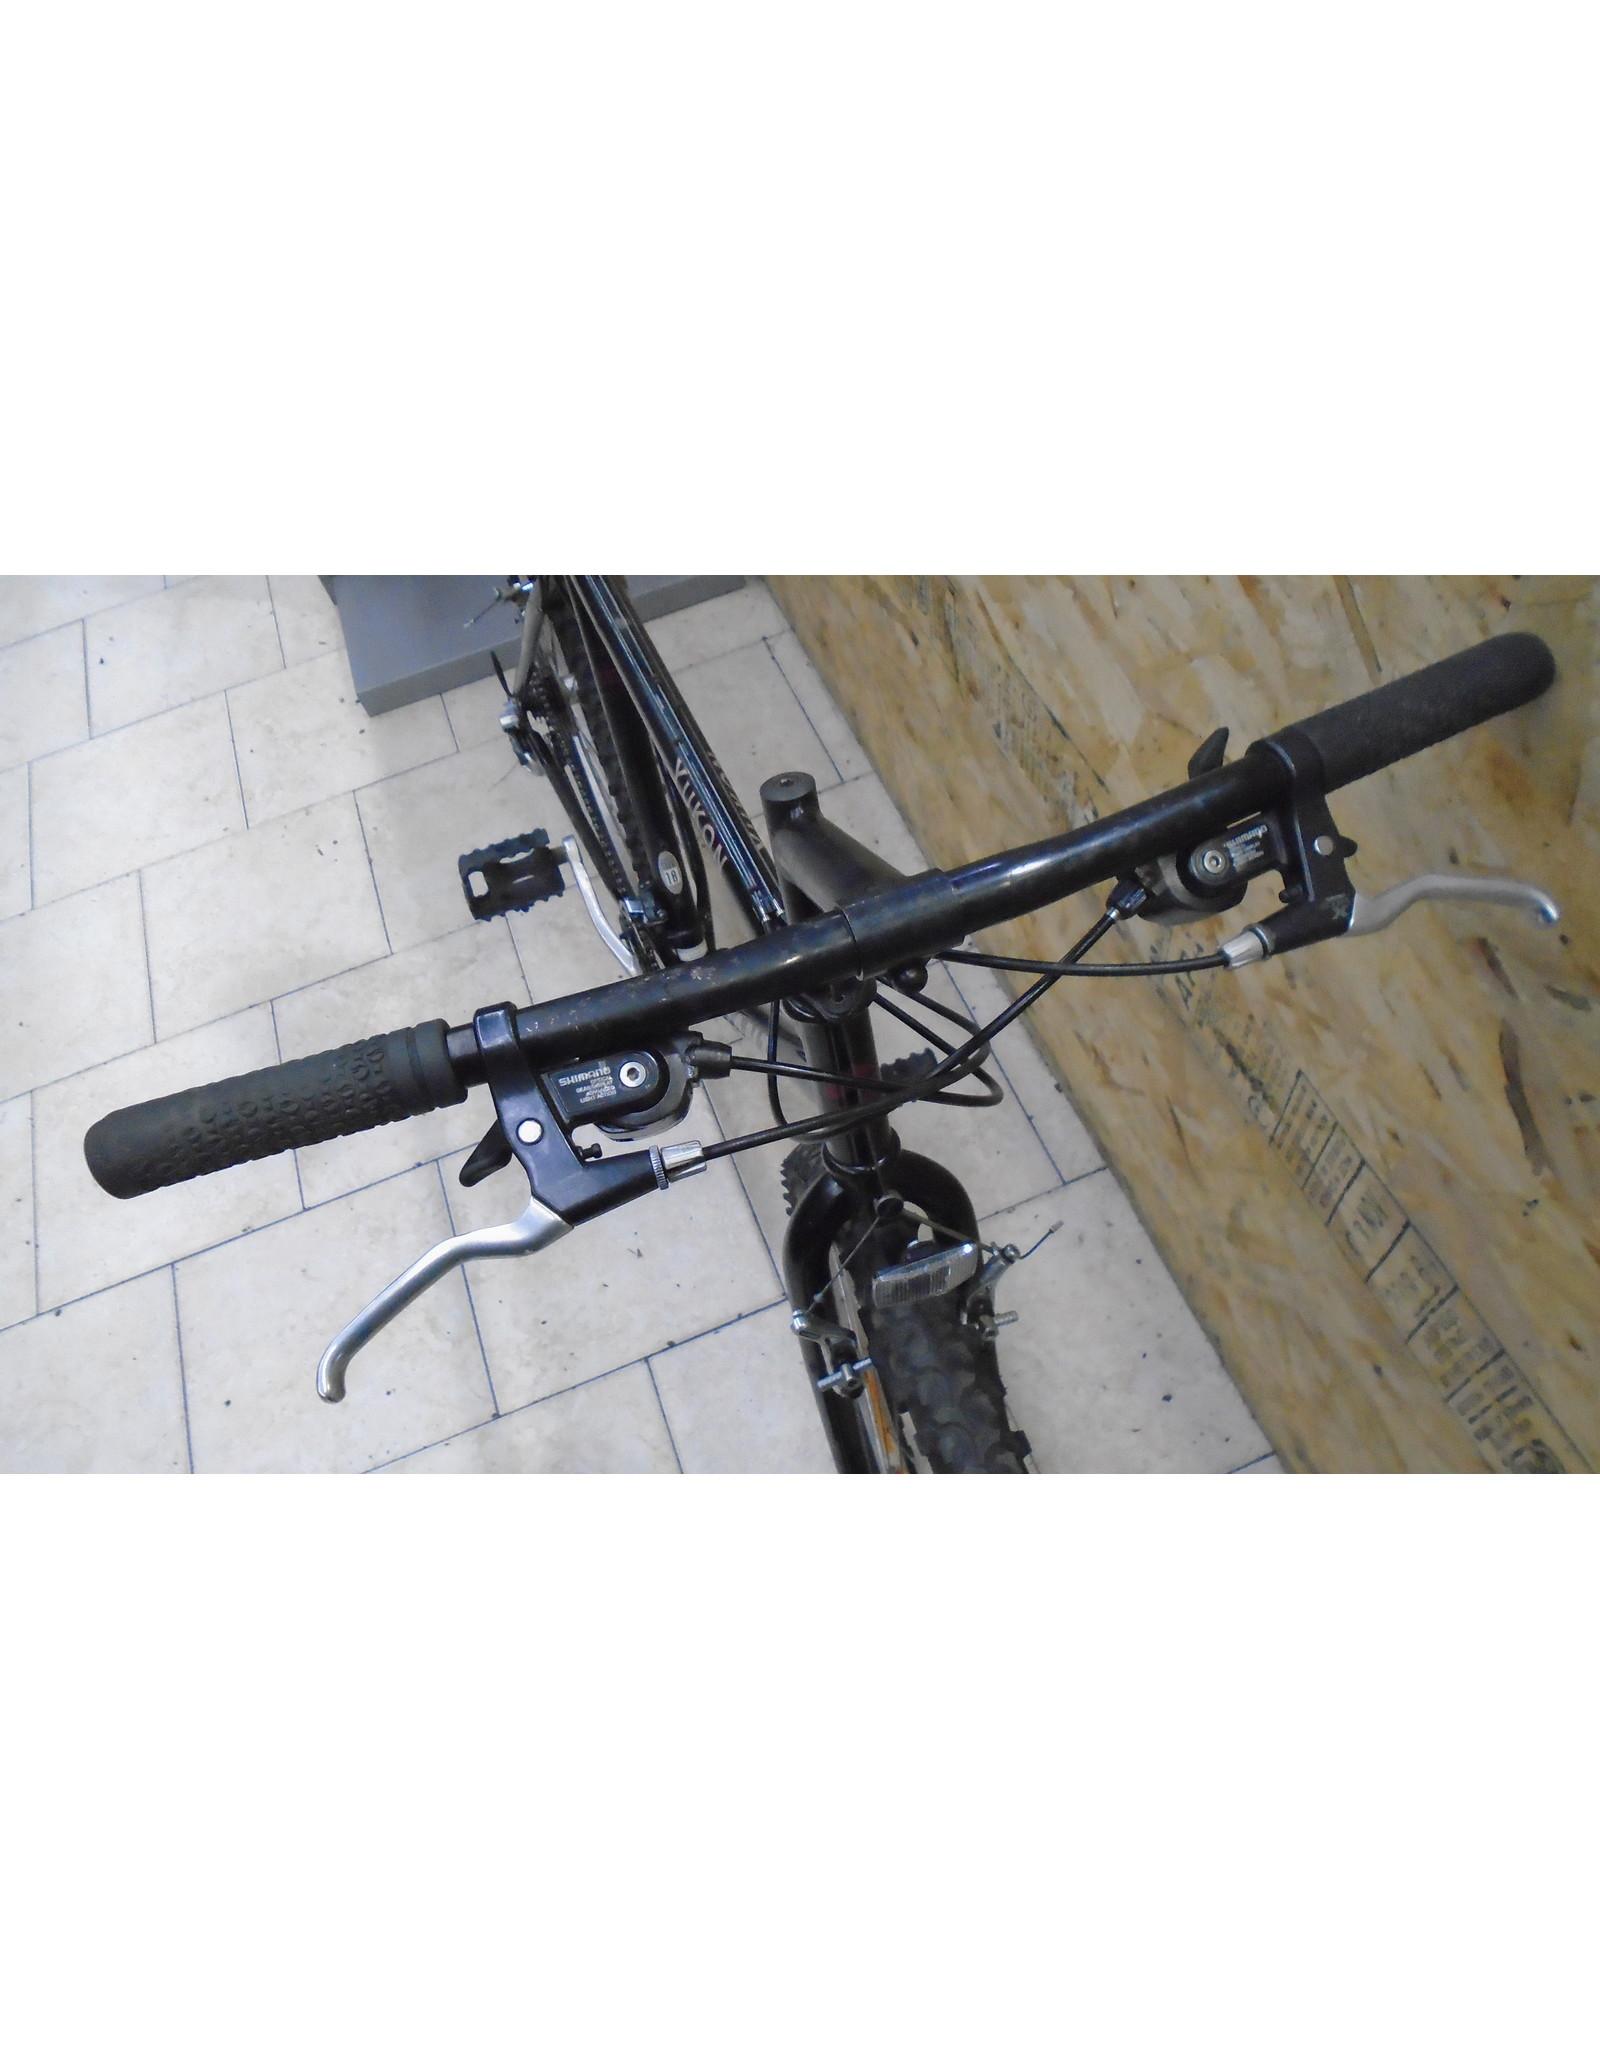 "Vélo usagé de montagne Giant 18"" - 10435"